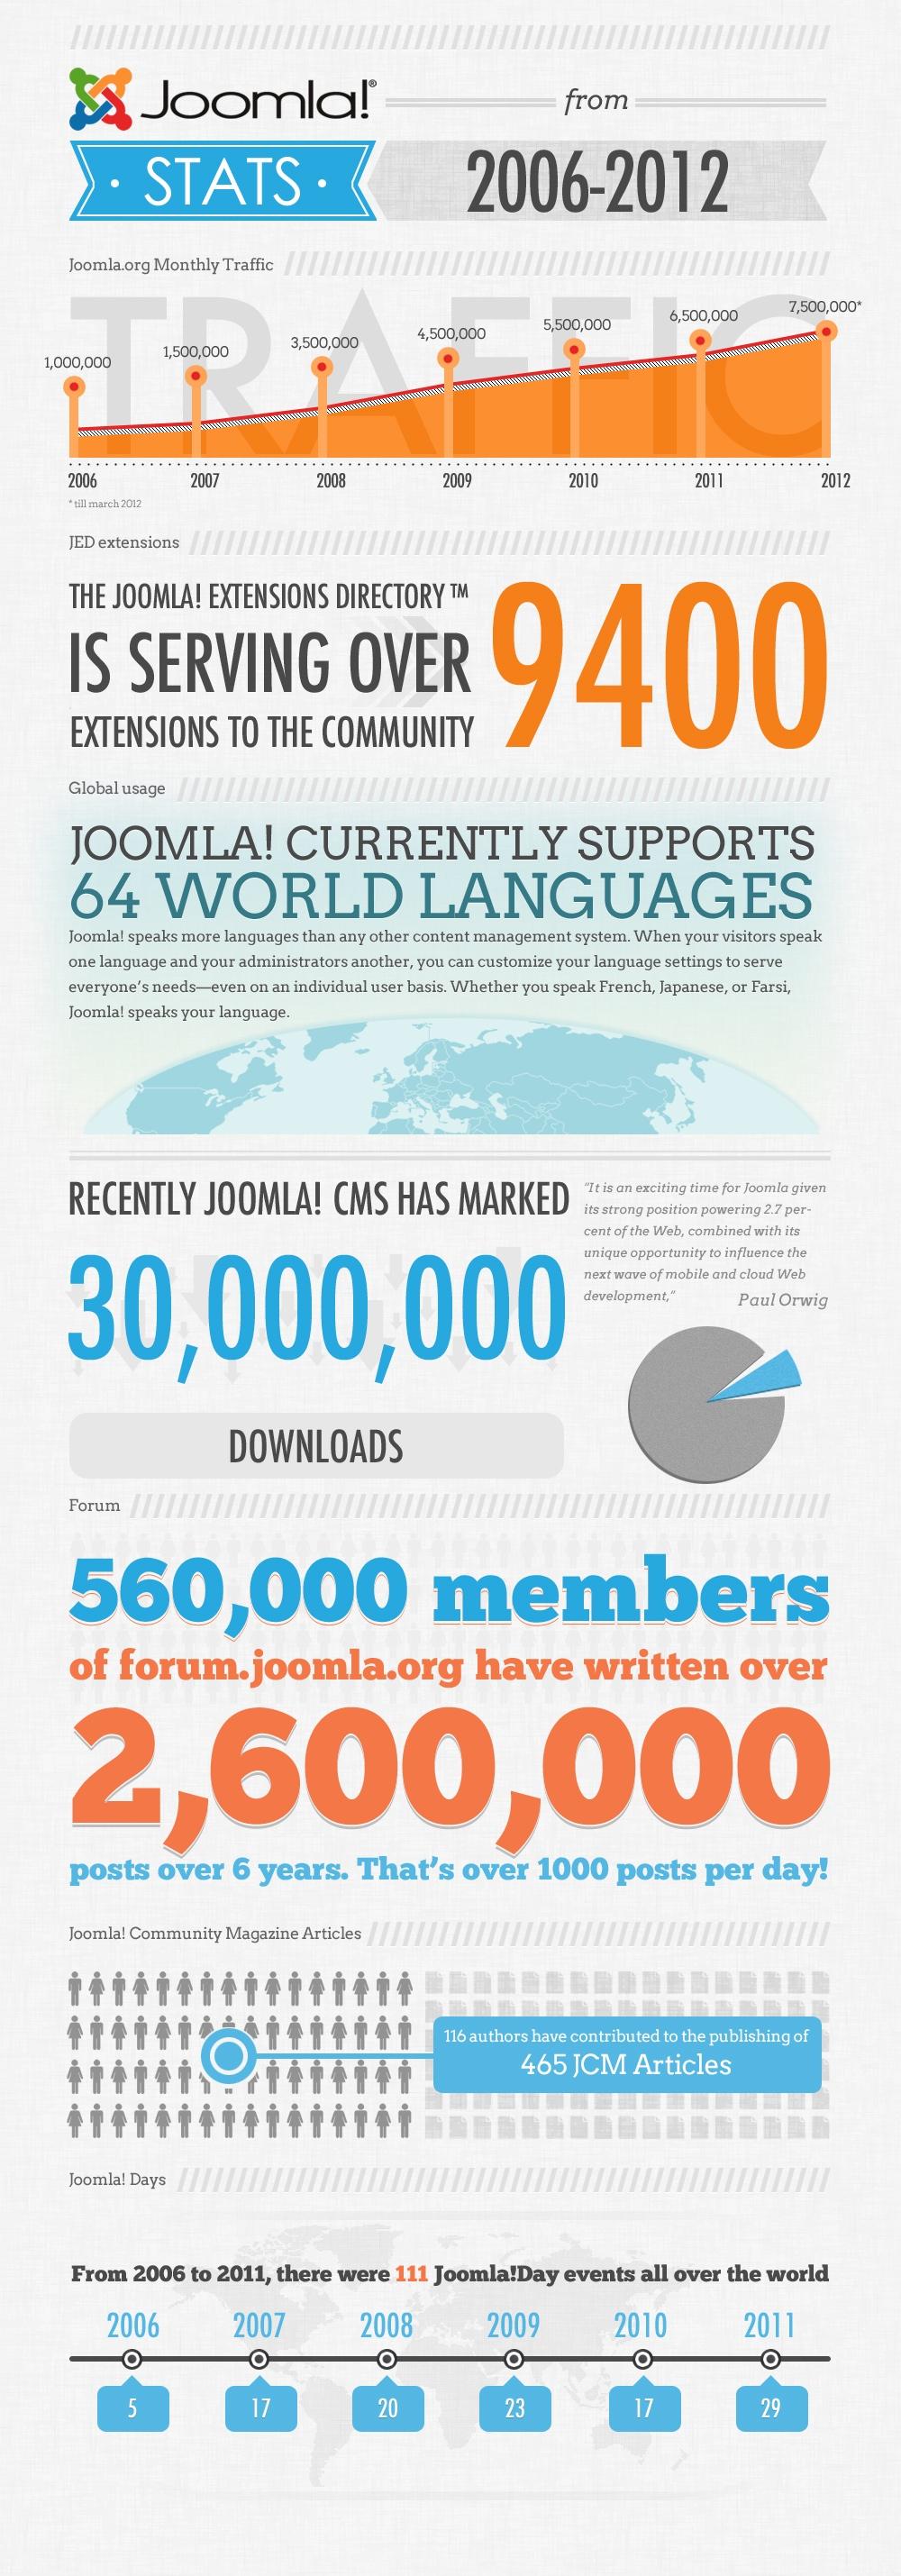 Joomla Infographic